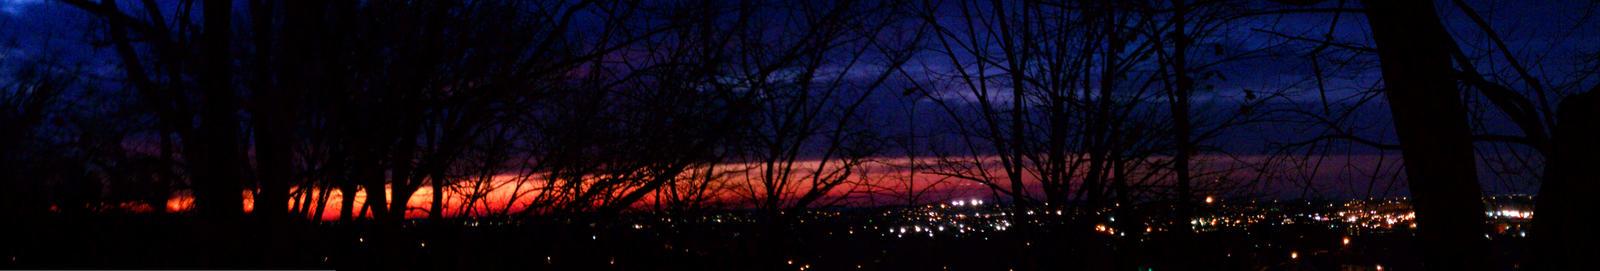 Sunset Panorama Huge by HeavyMetalWaterfall